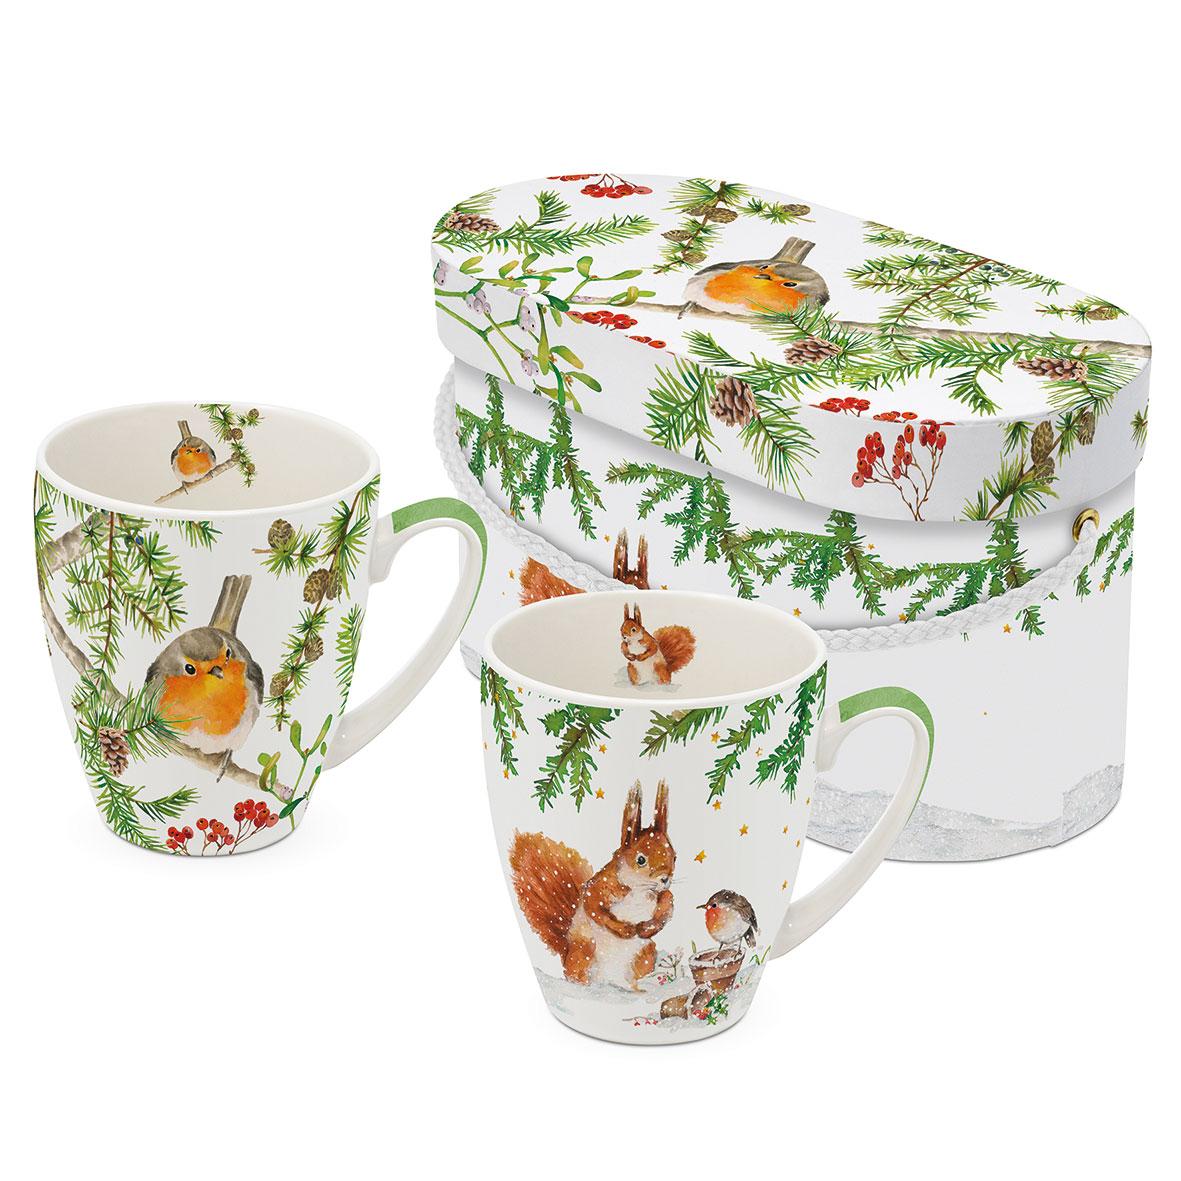 Robin in Tree 2 Mug Set GB